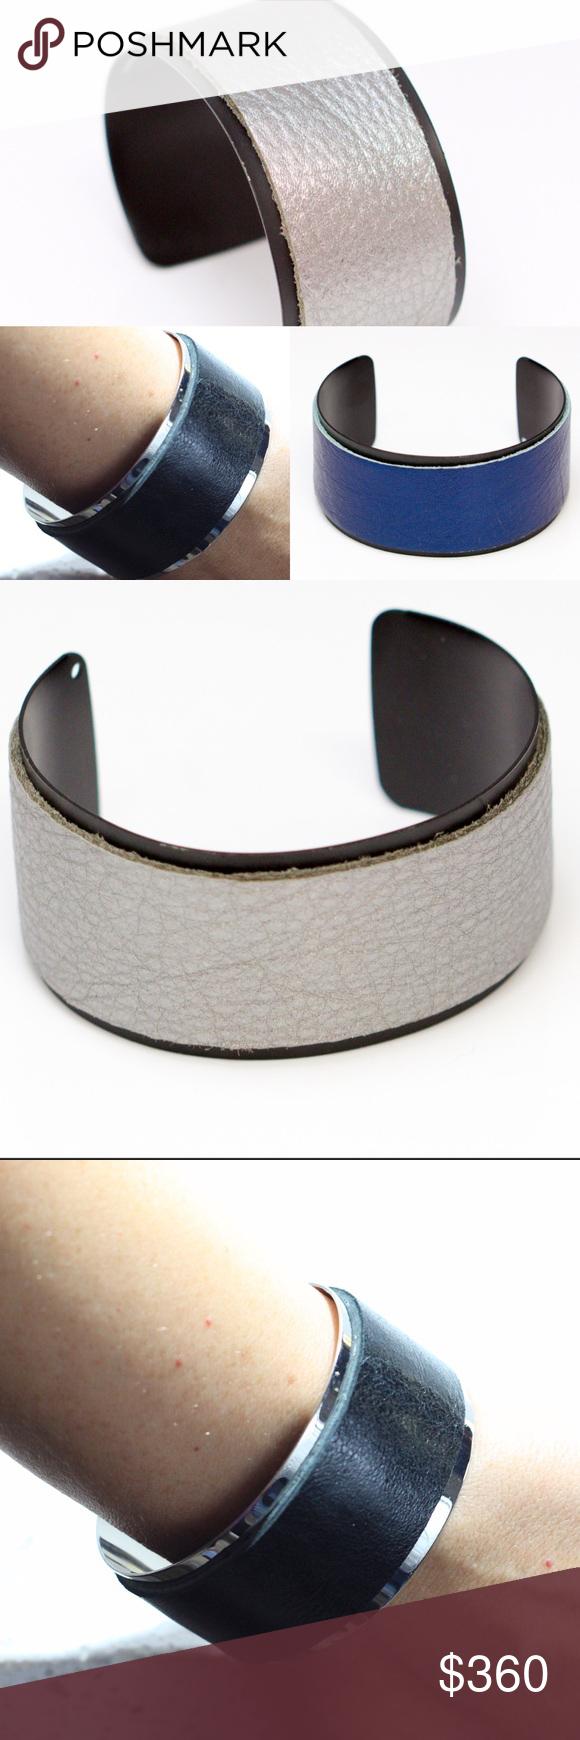 "Metallic leather combo cuff bundle retail $900 Metallic blue/black leather cuff bracelet (2) metallic black/chrome leather cuff bracelet (2) pewter/black leather cuff bracelet (2) they are 6.75"" adjustable David Galan Jewelry Bracelets"